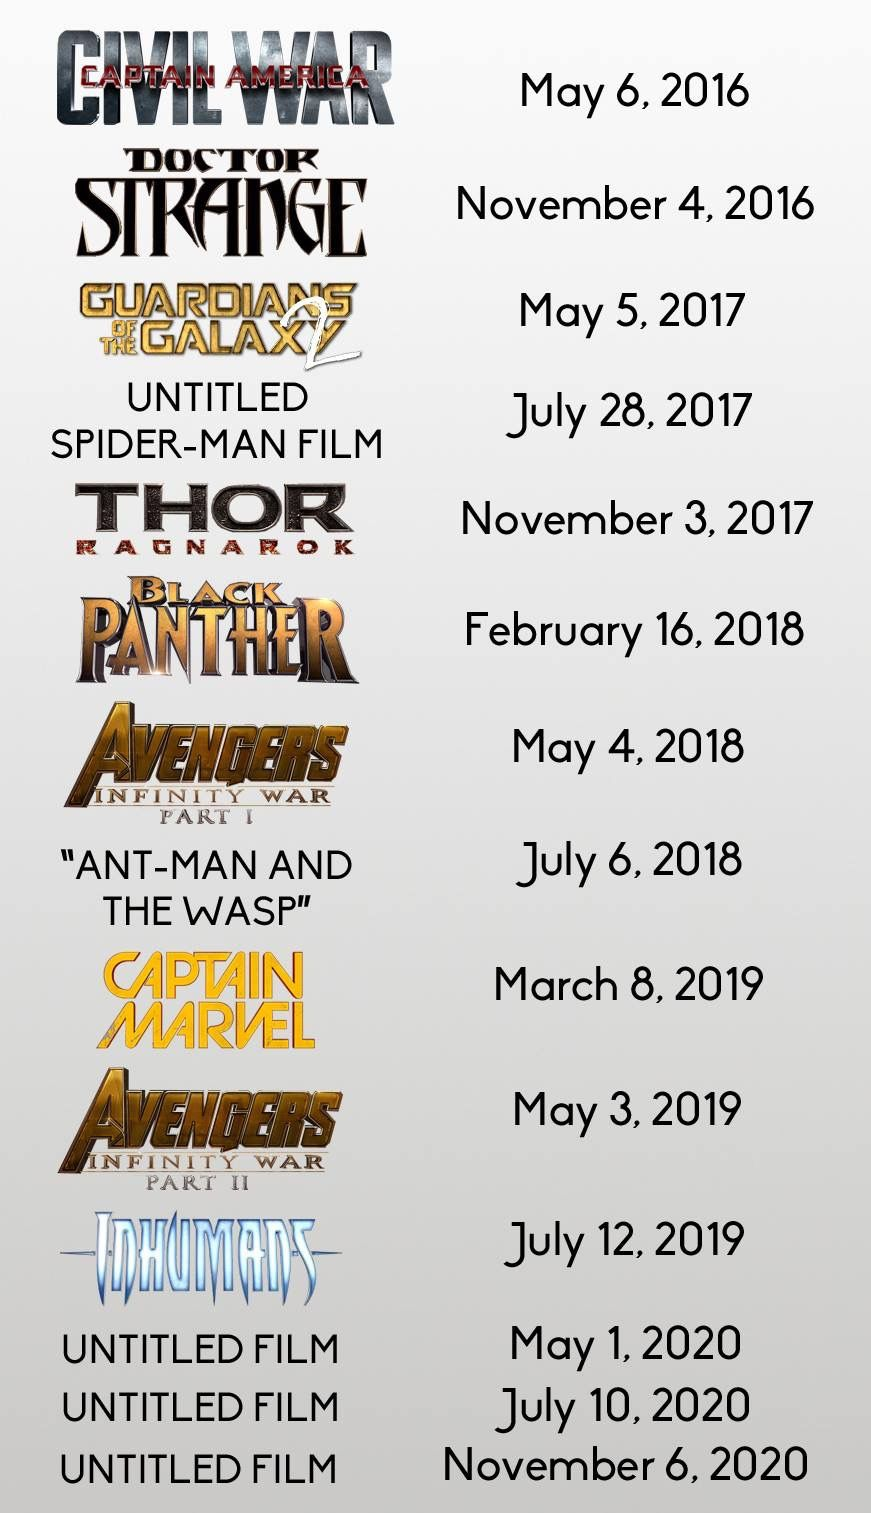 Marvel Cinematic Universe movie release update